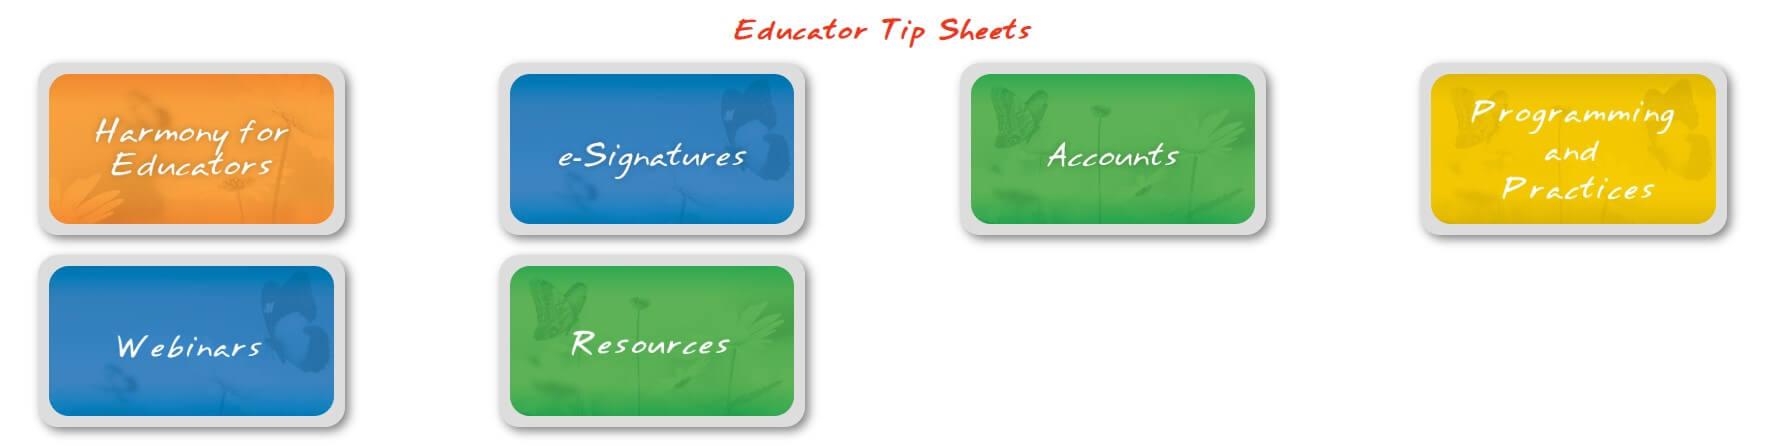 Harmony Web for Educators Support Portal